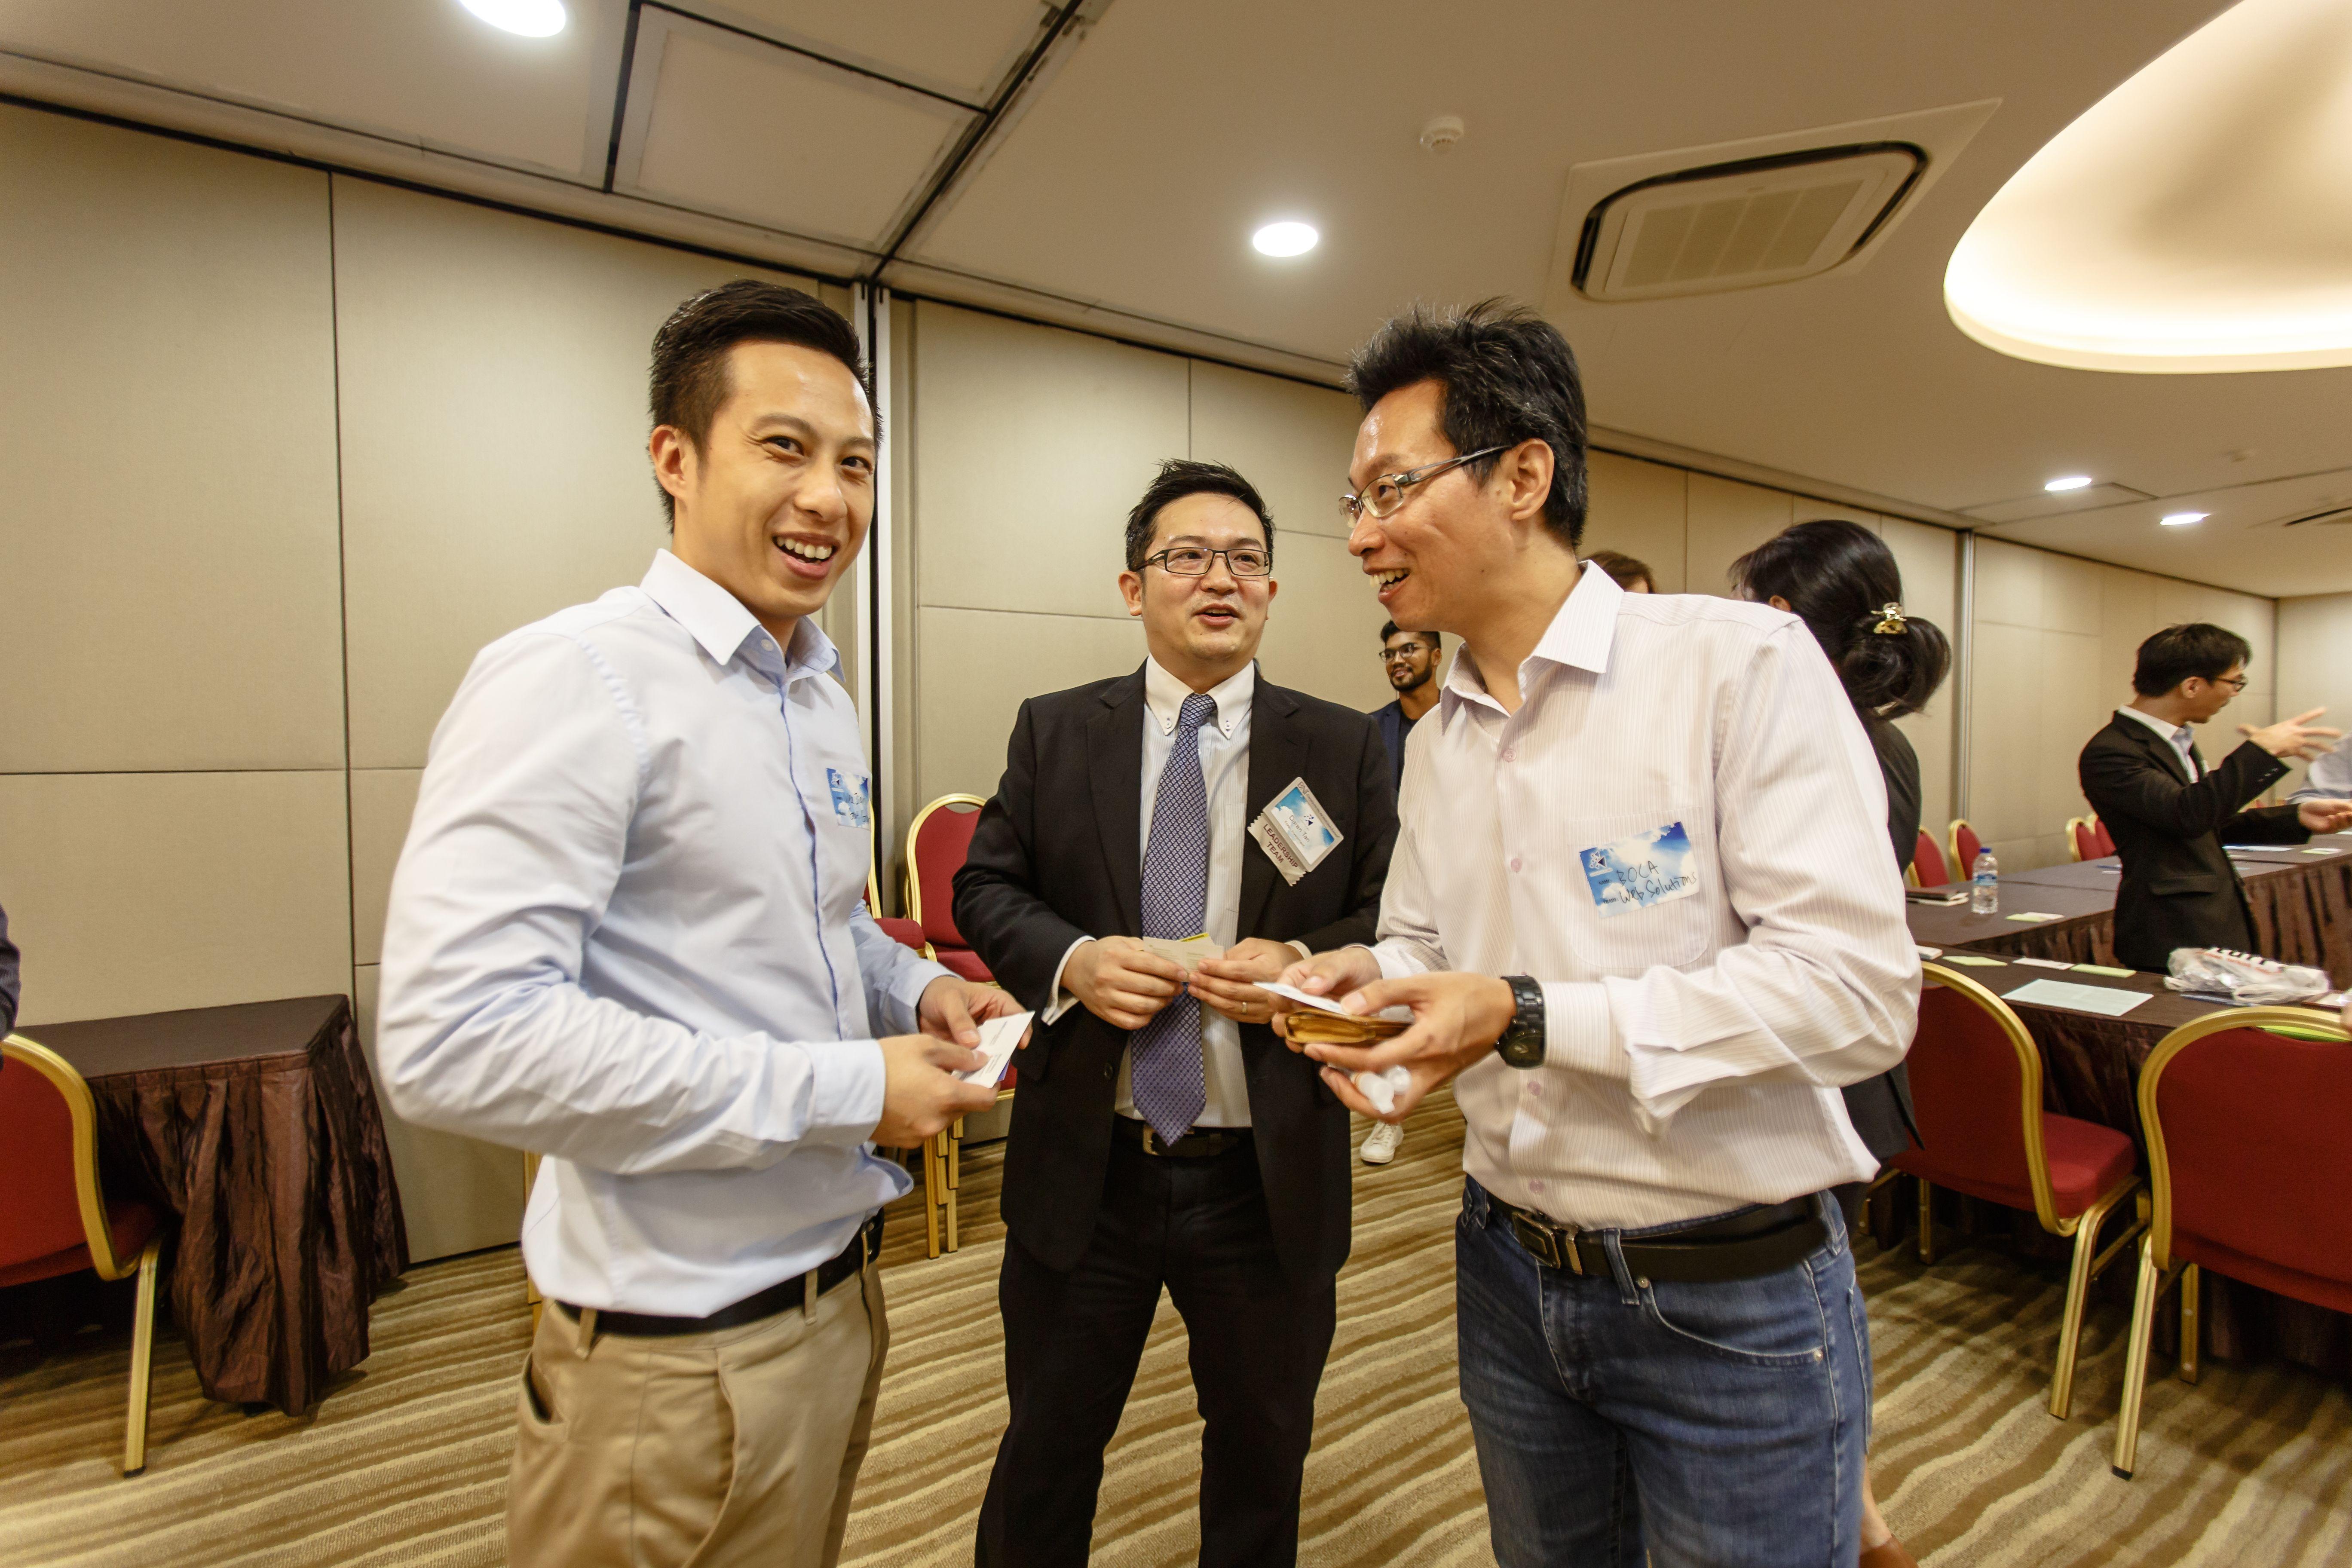 Latest Blog On Bni Singapore Members List Check More At Https